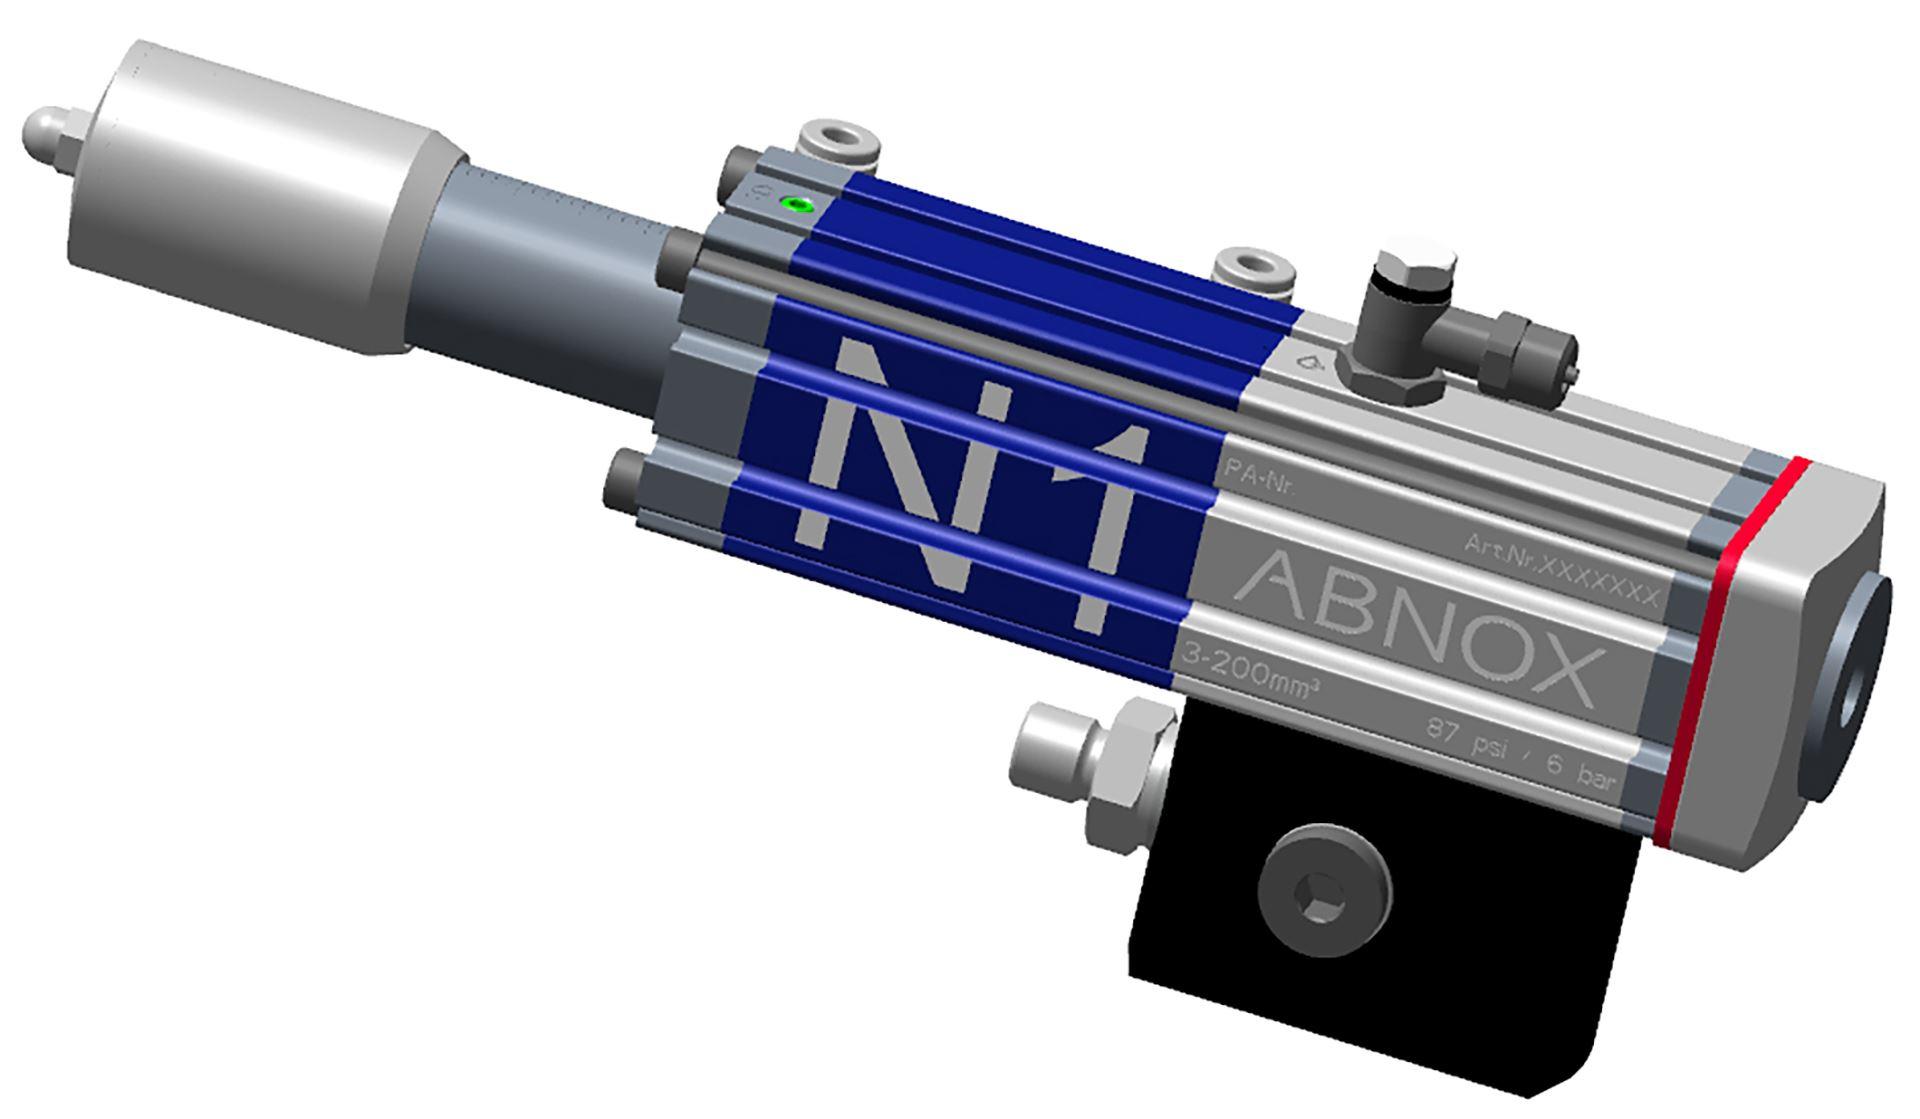 ABNOX Nadeldosierventil AXDV-N1